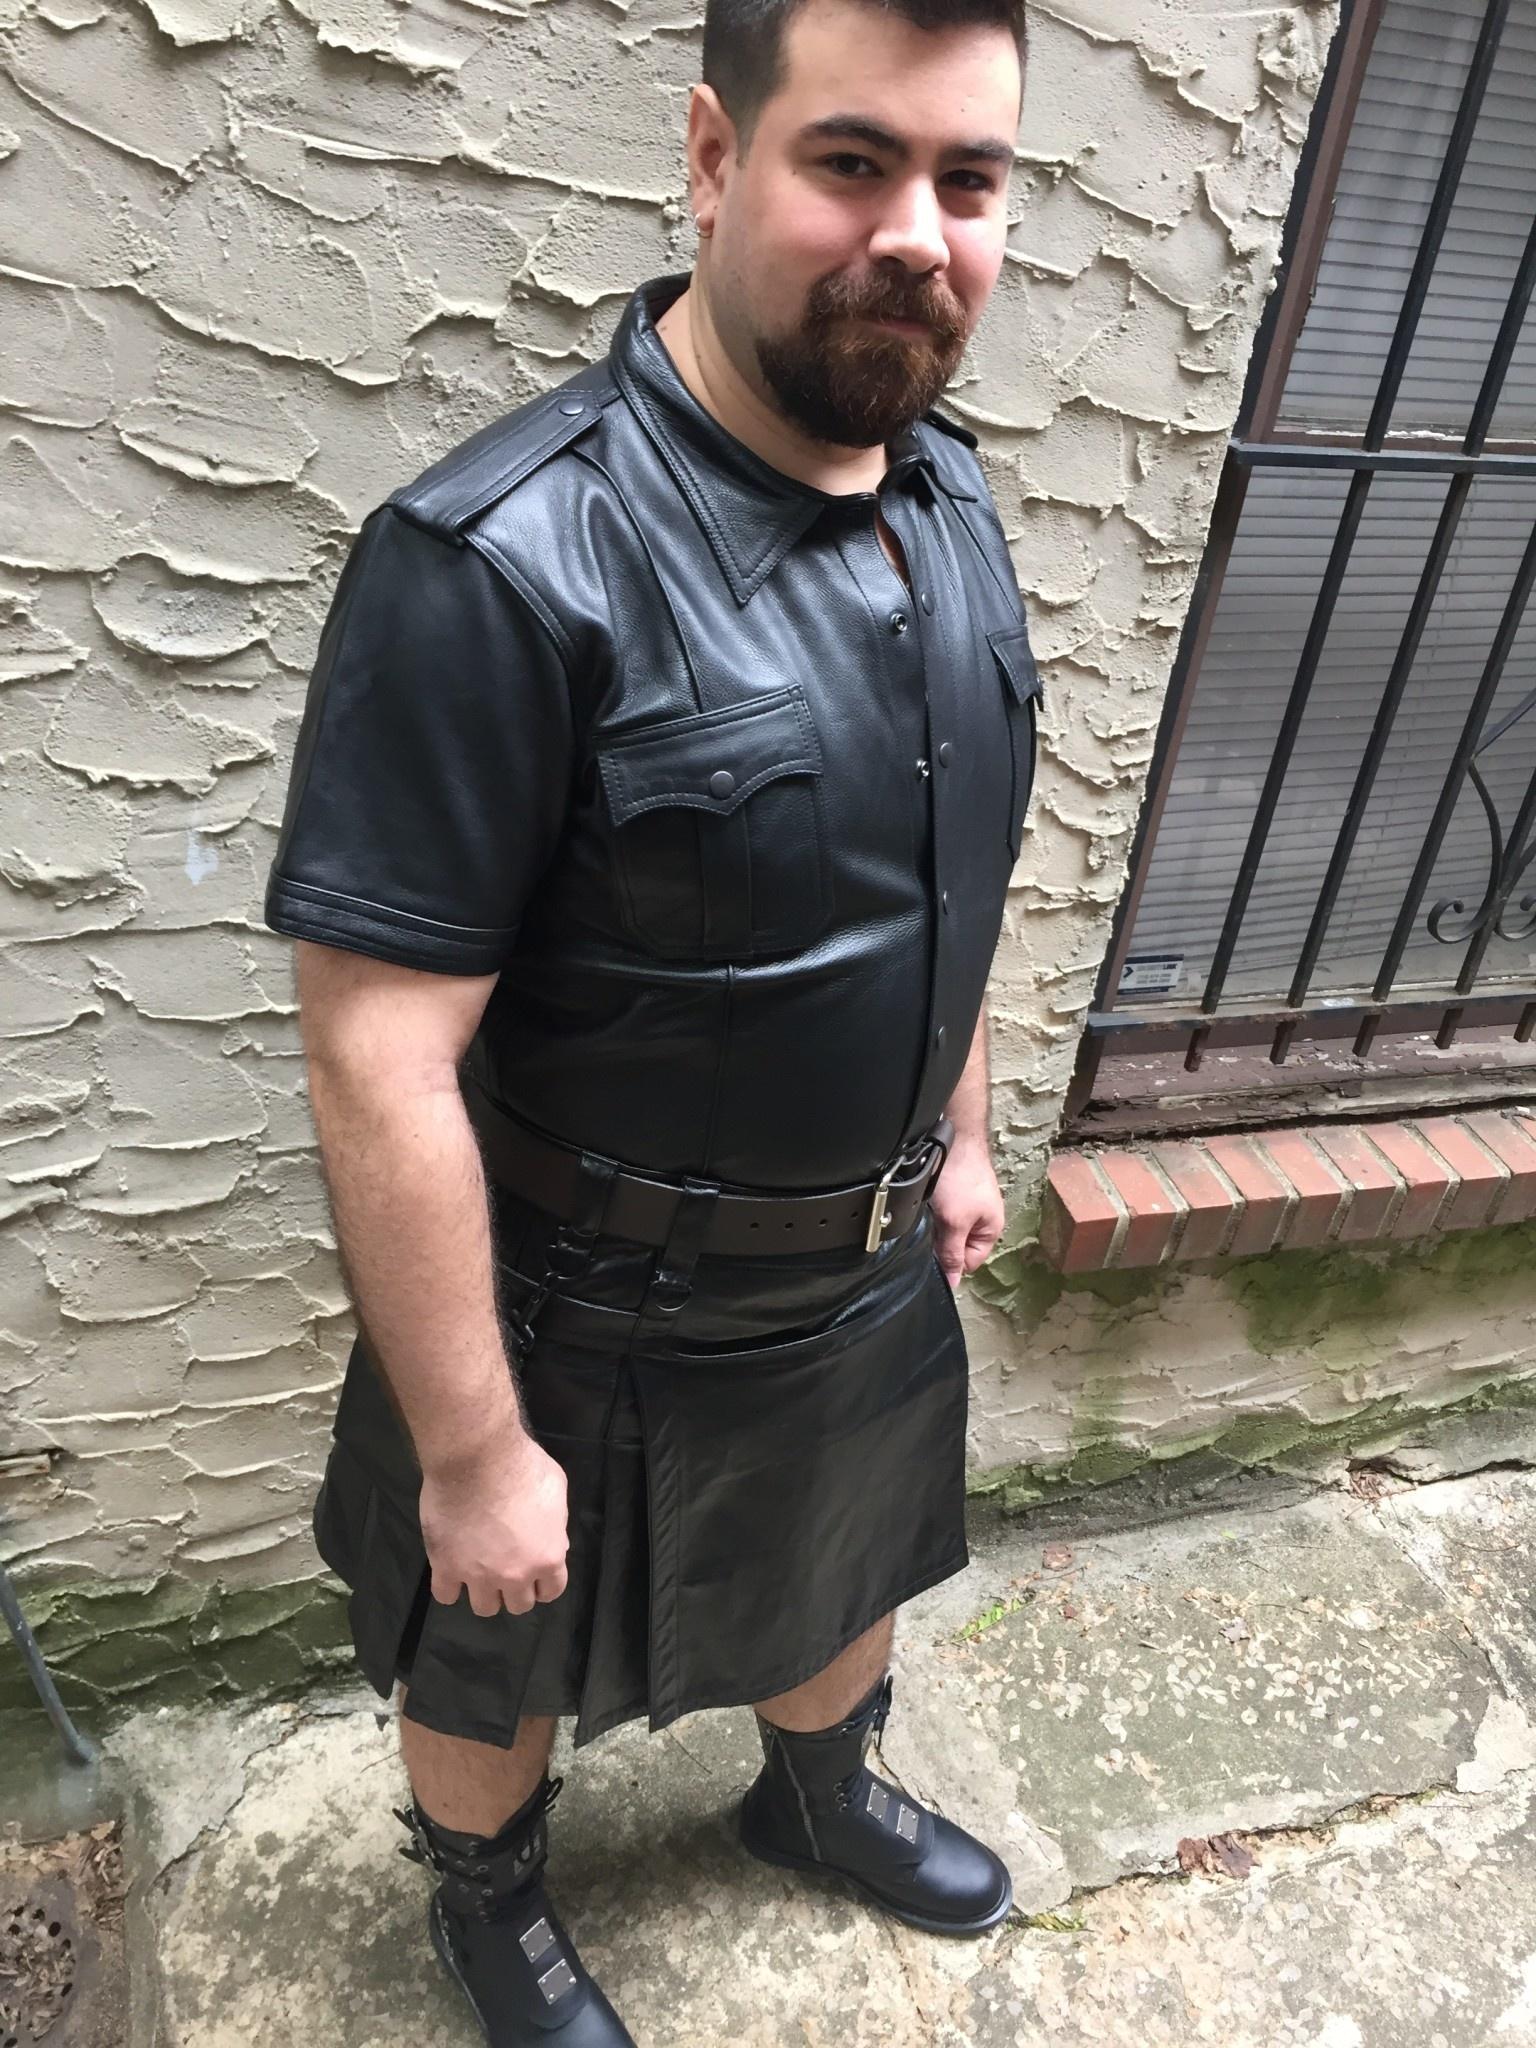 PASSIONAL Cowhide Heritage Kilt w/ Box Pleats